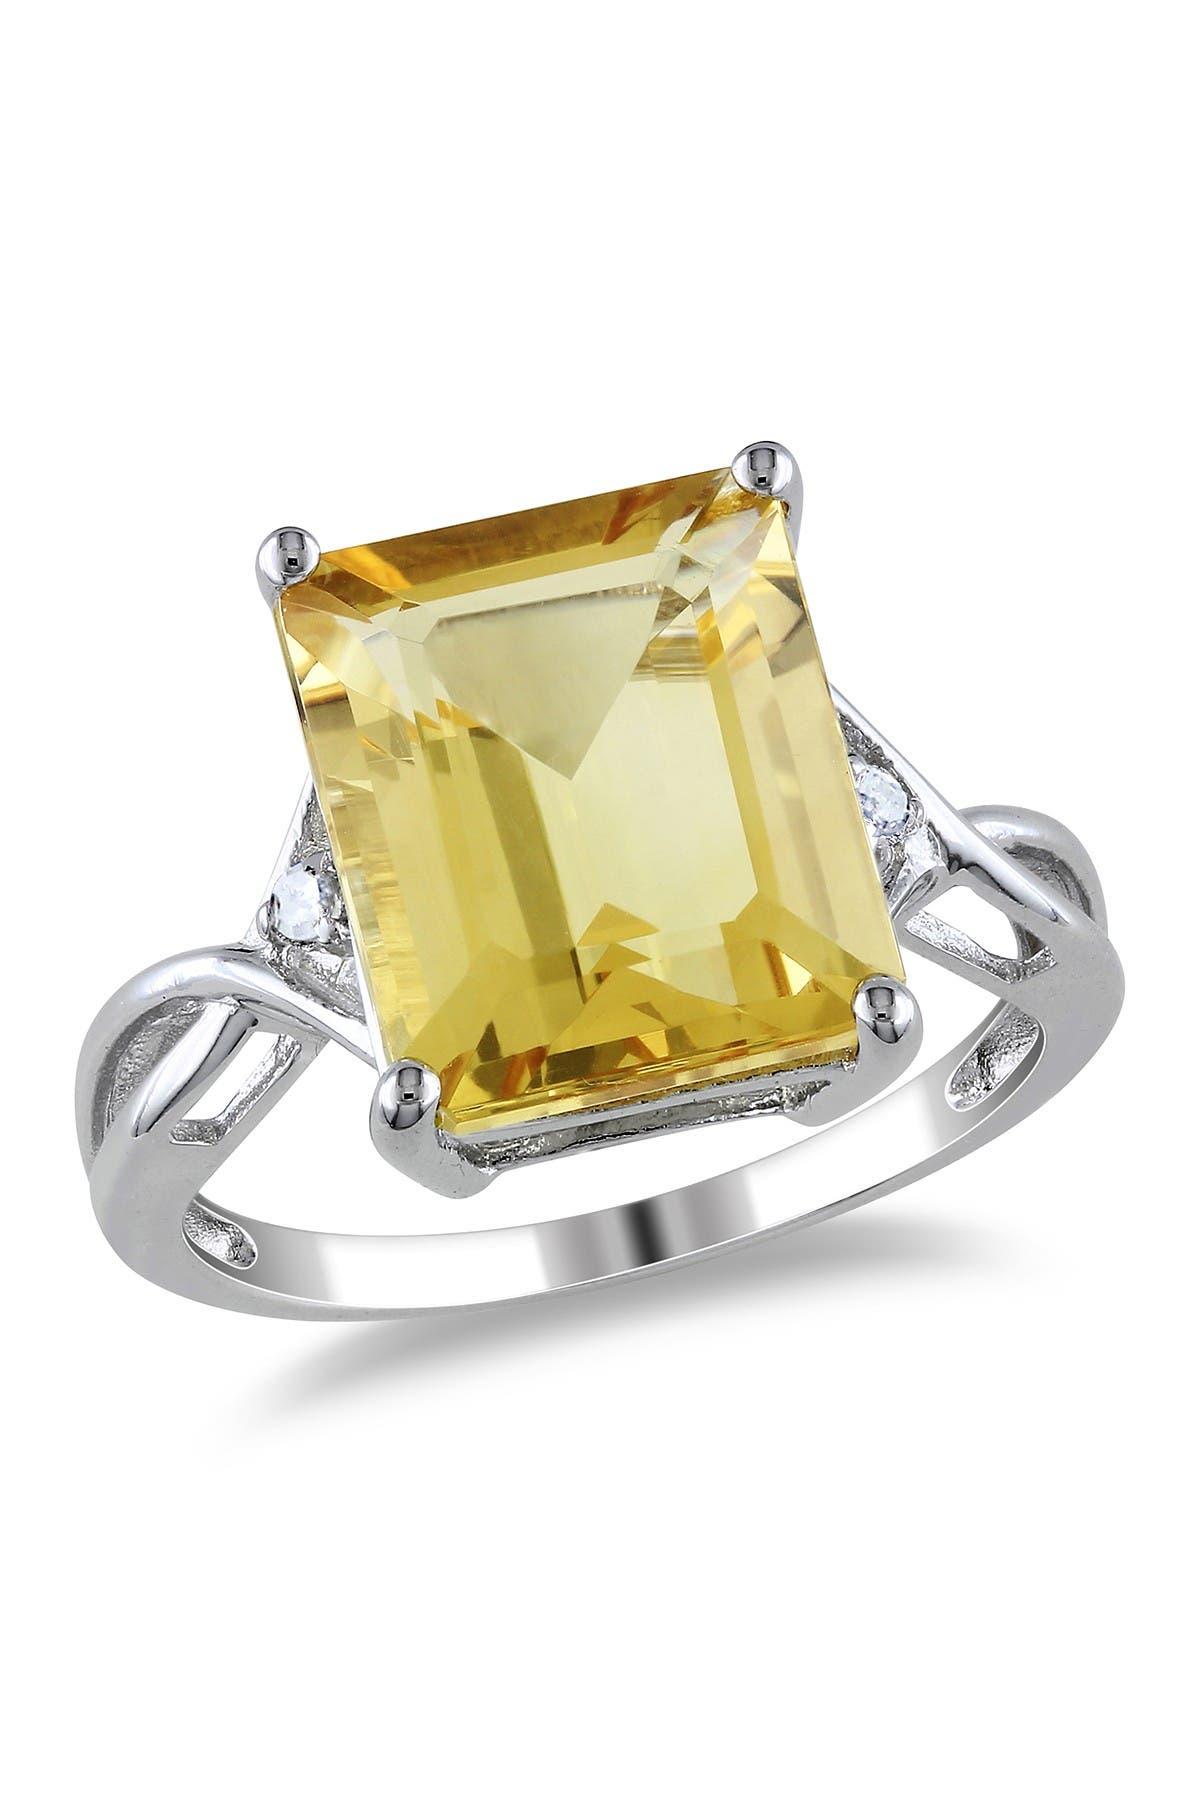 Image of Delmar Sterling Silver Citrine & White Topaz Emerald Ring